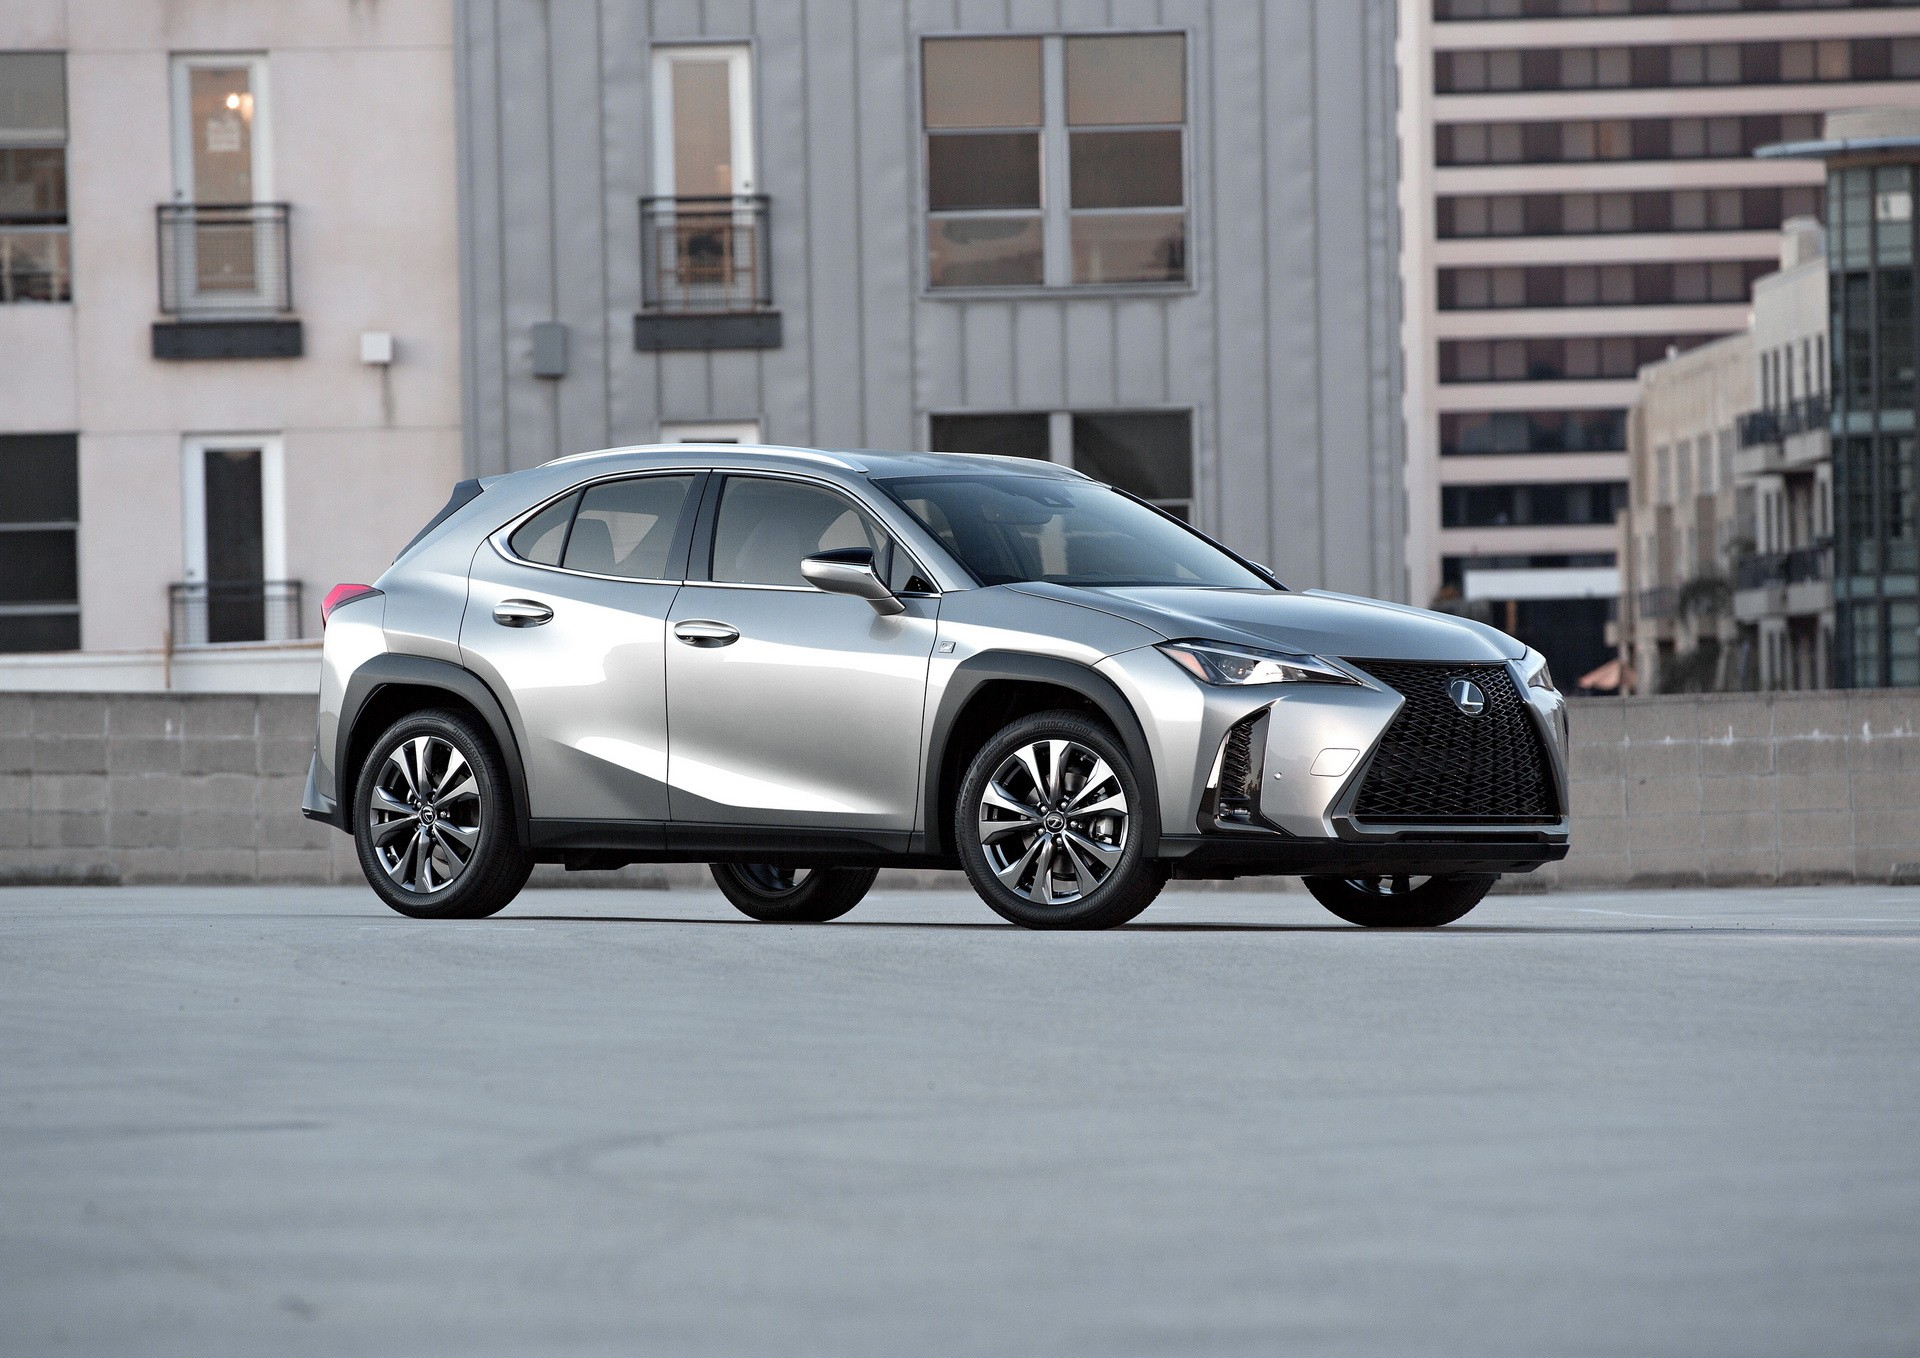 2020 Lexus CT 200h New Review